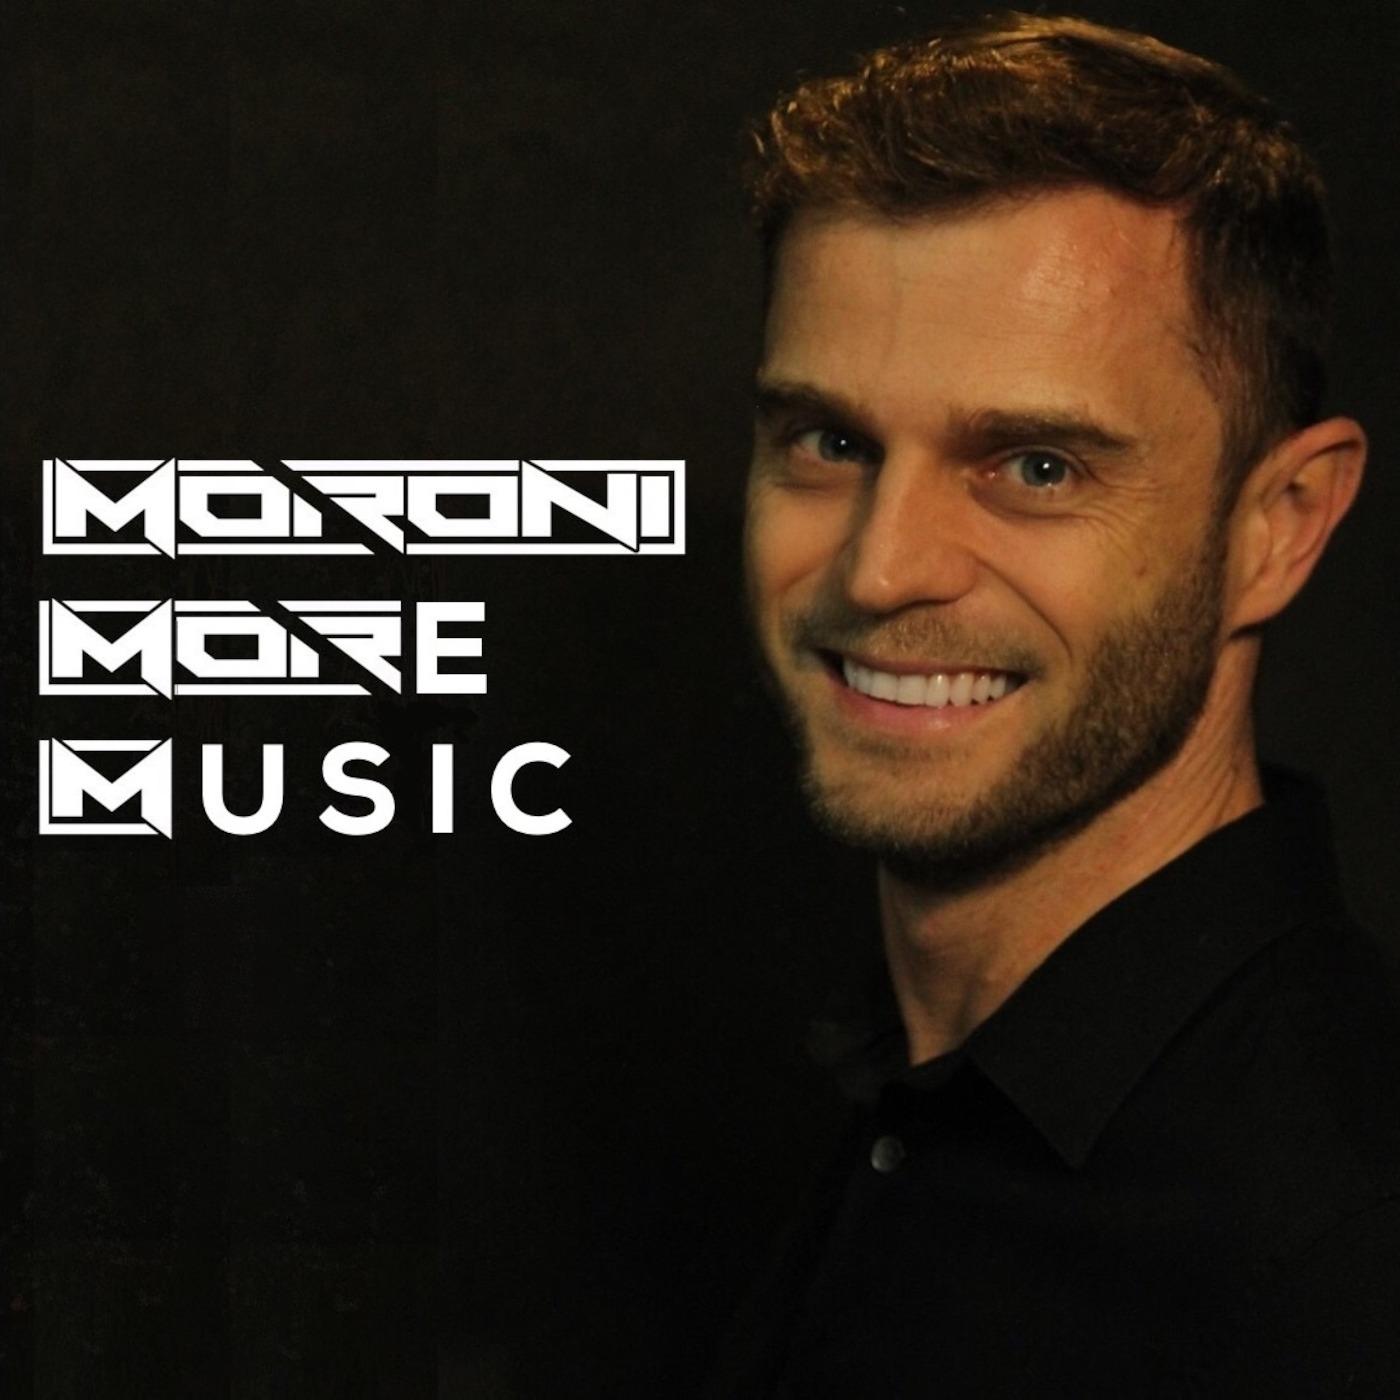 Moroni More Music